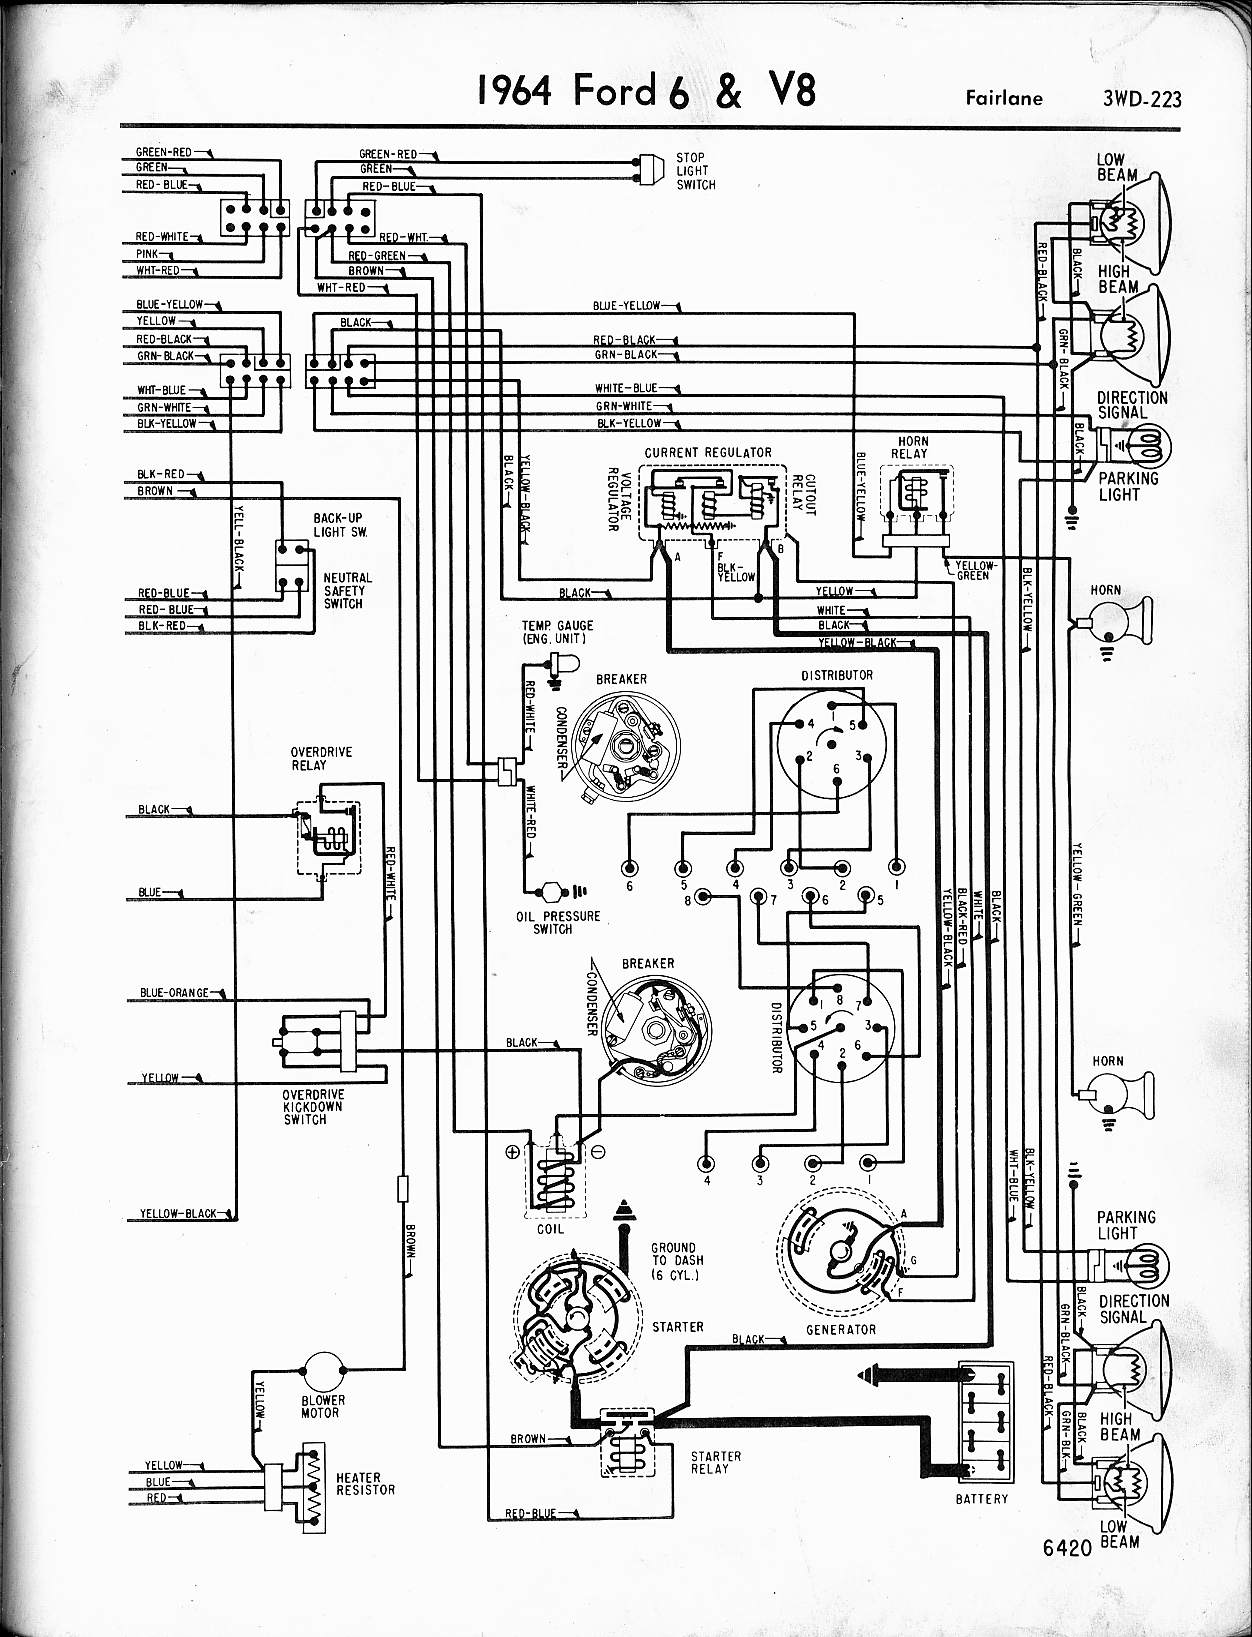 ... 66 1966 Ford F100 Dash Wiring Diagram - Electrical wiring diagrams F Wiring  Diagram on 66 f100 ...